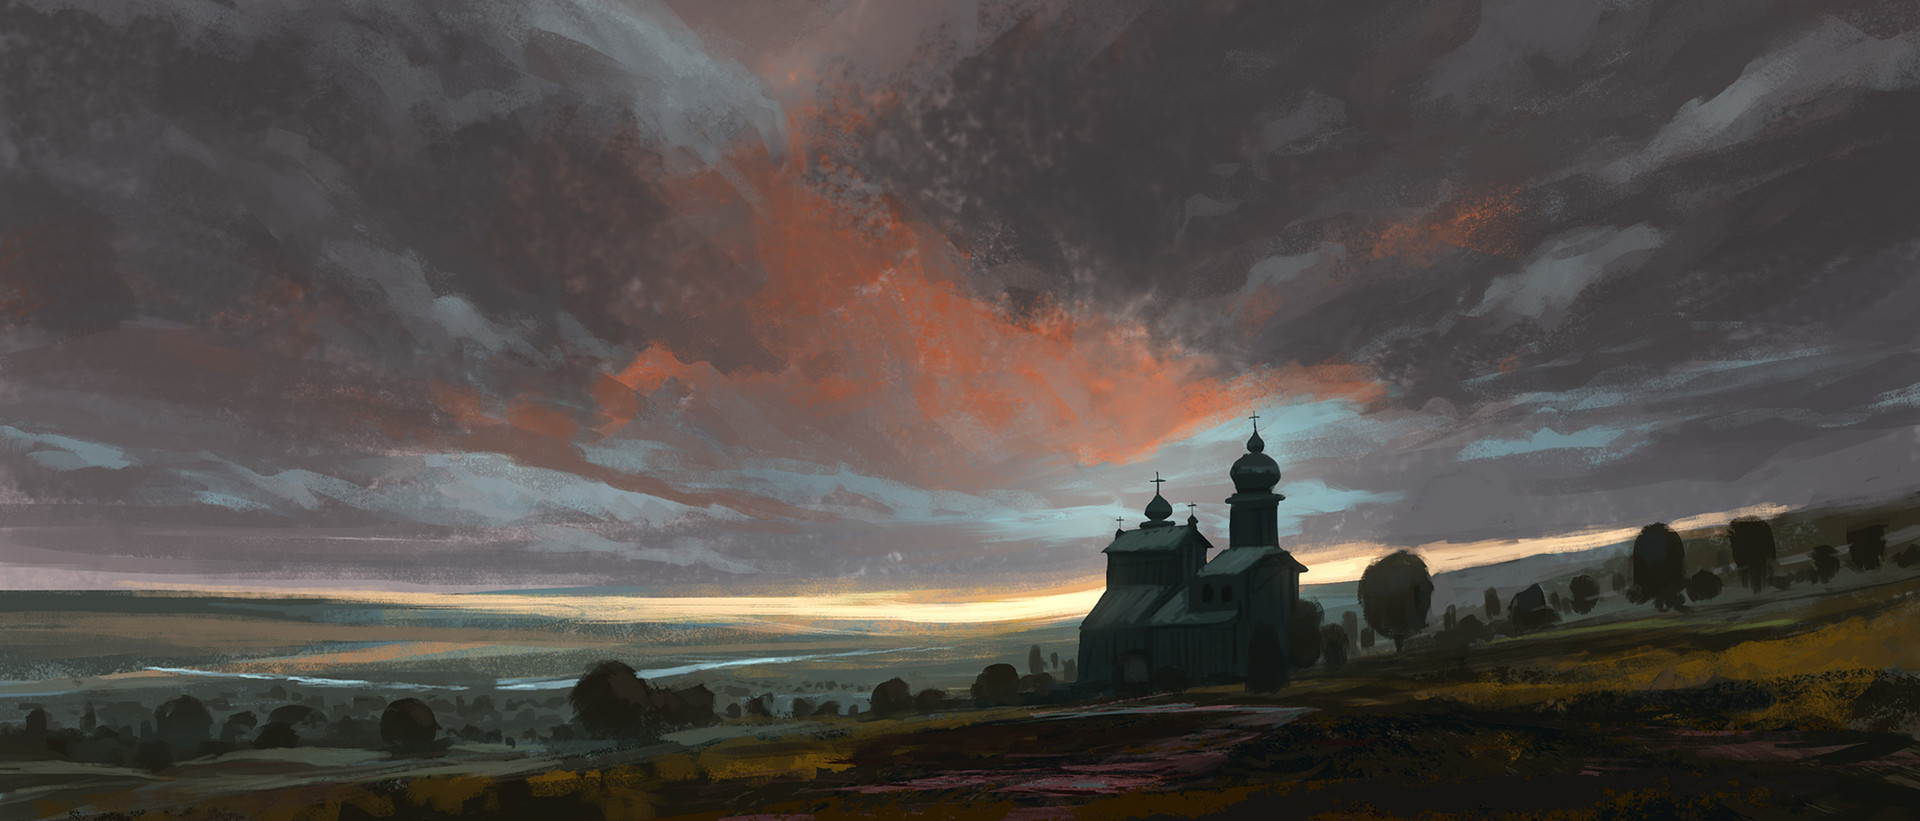 Quentin regnes 04 clouds ukraine stalker